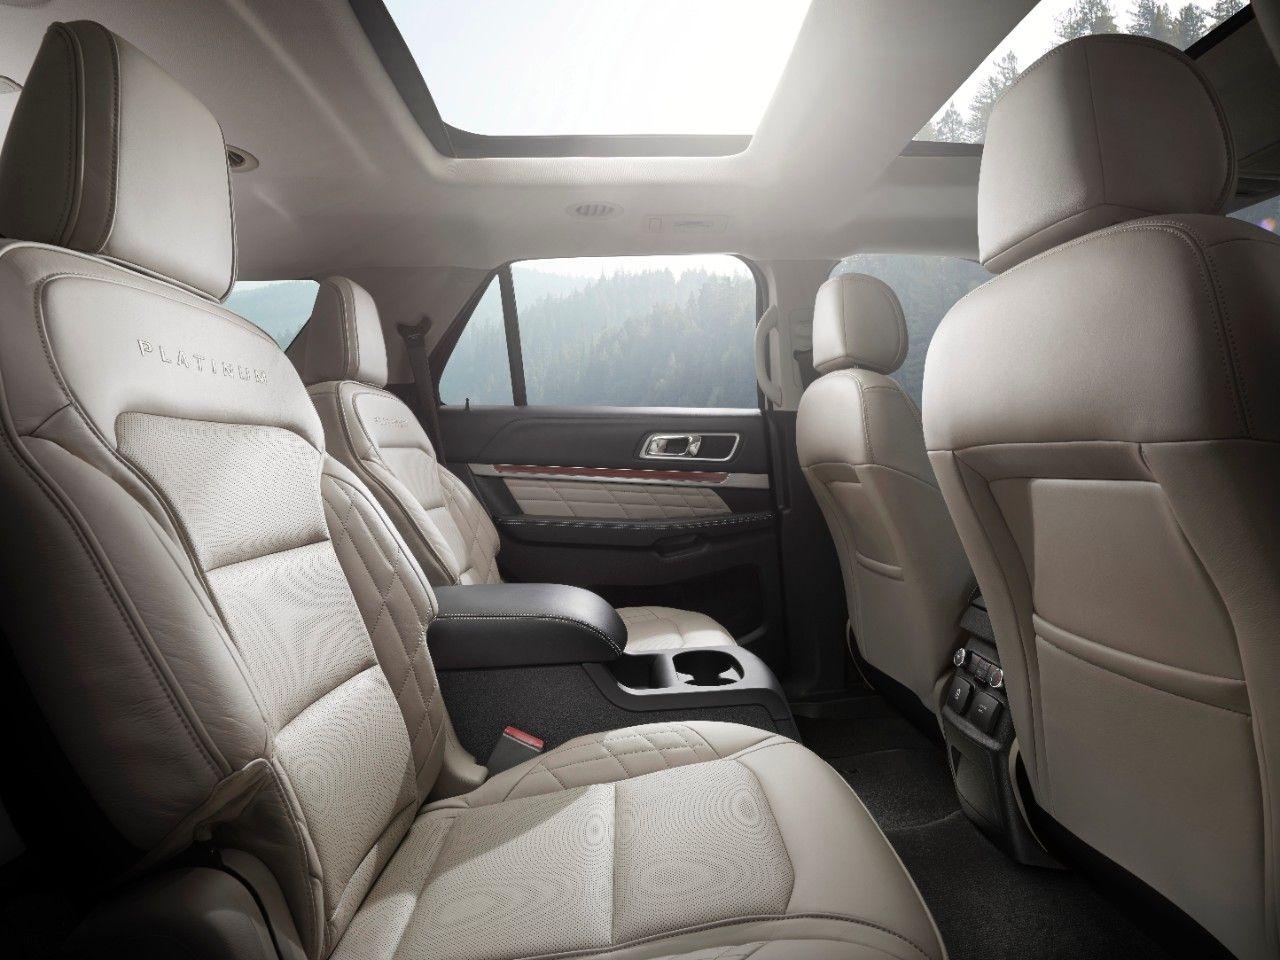 2016 Ford Explorer Http Statewideford Com Van Wert Lima Fort Wayne Dealer New Ford Explore Ford Explorer Ford Explorer Interior Ford Explorer Price